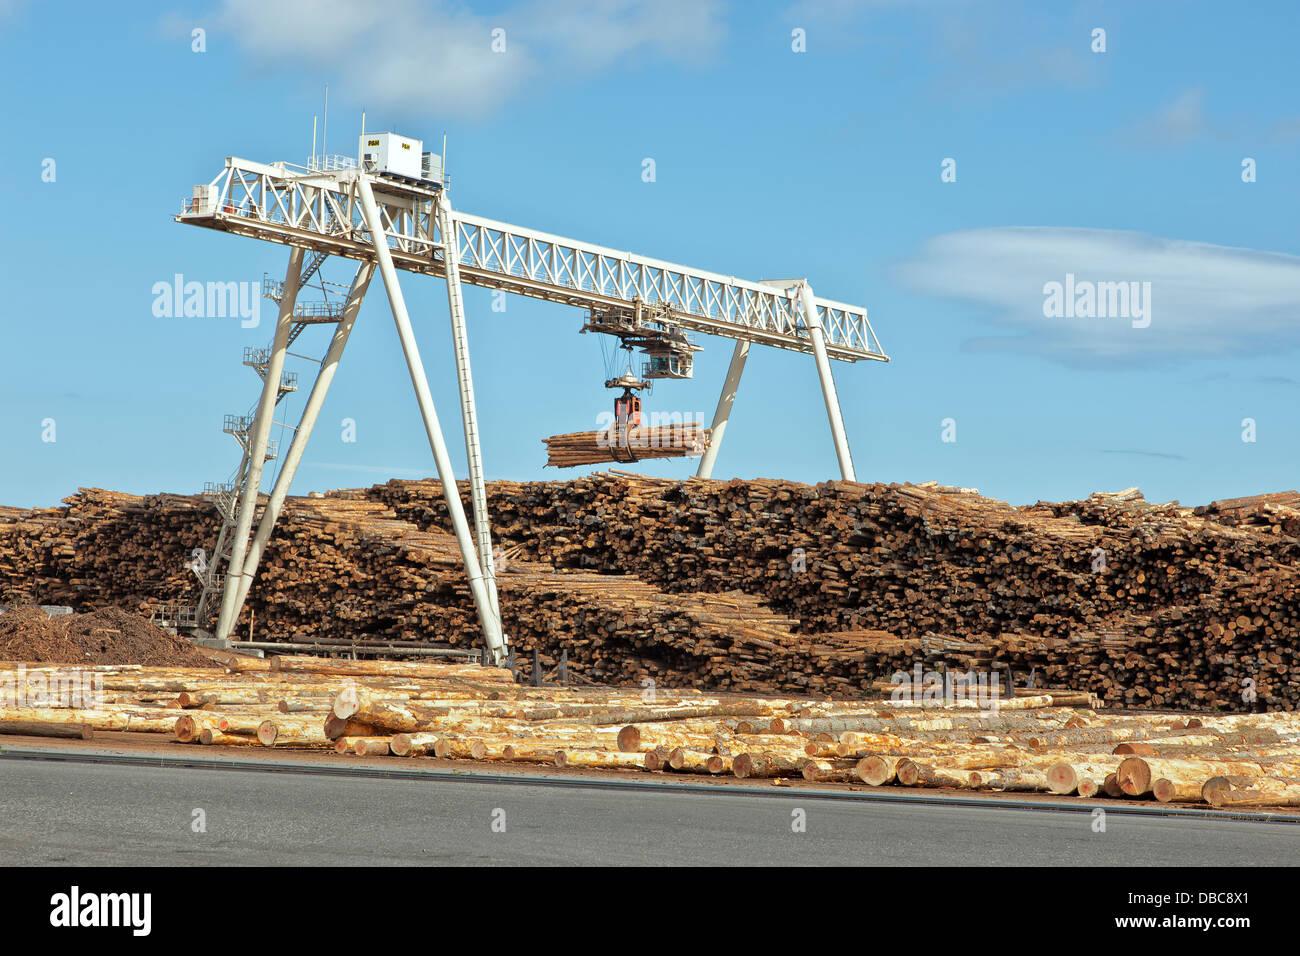 P & H crane stockpiling logs, lumber mill. - Stock Image